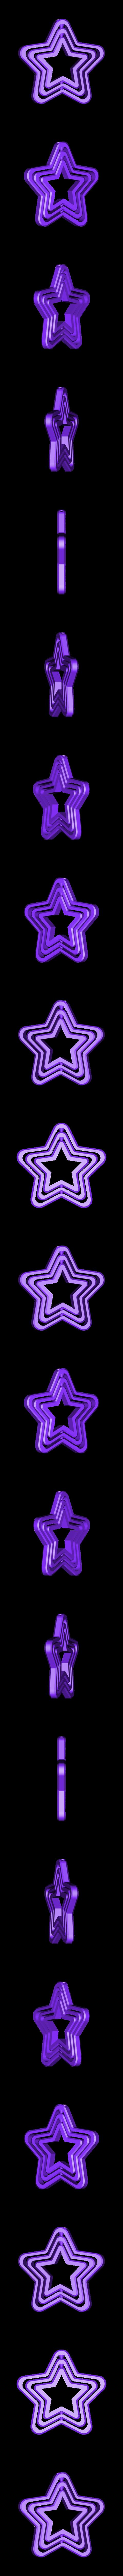 star_x3.stl Download free STL file Star Gyro • Object to 3D print, akira3dp0